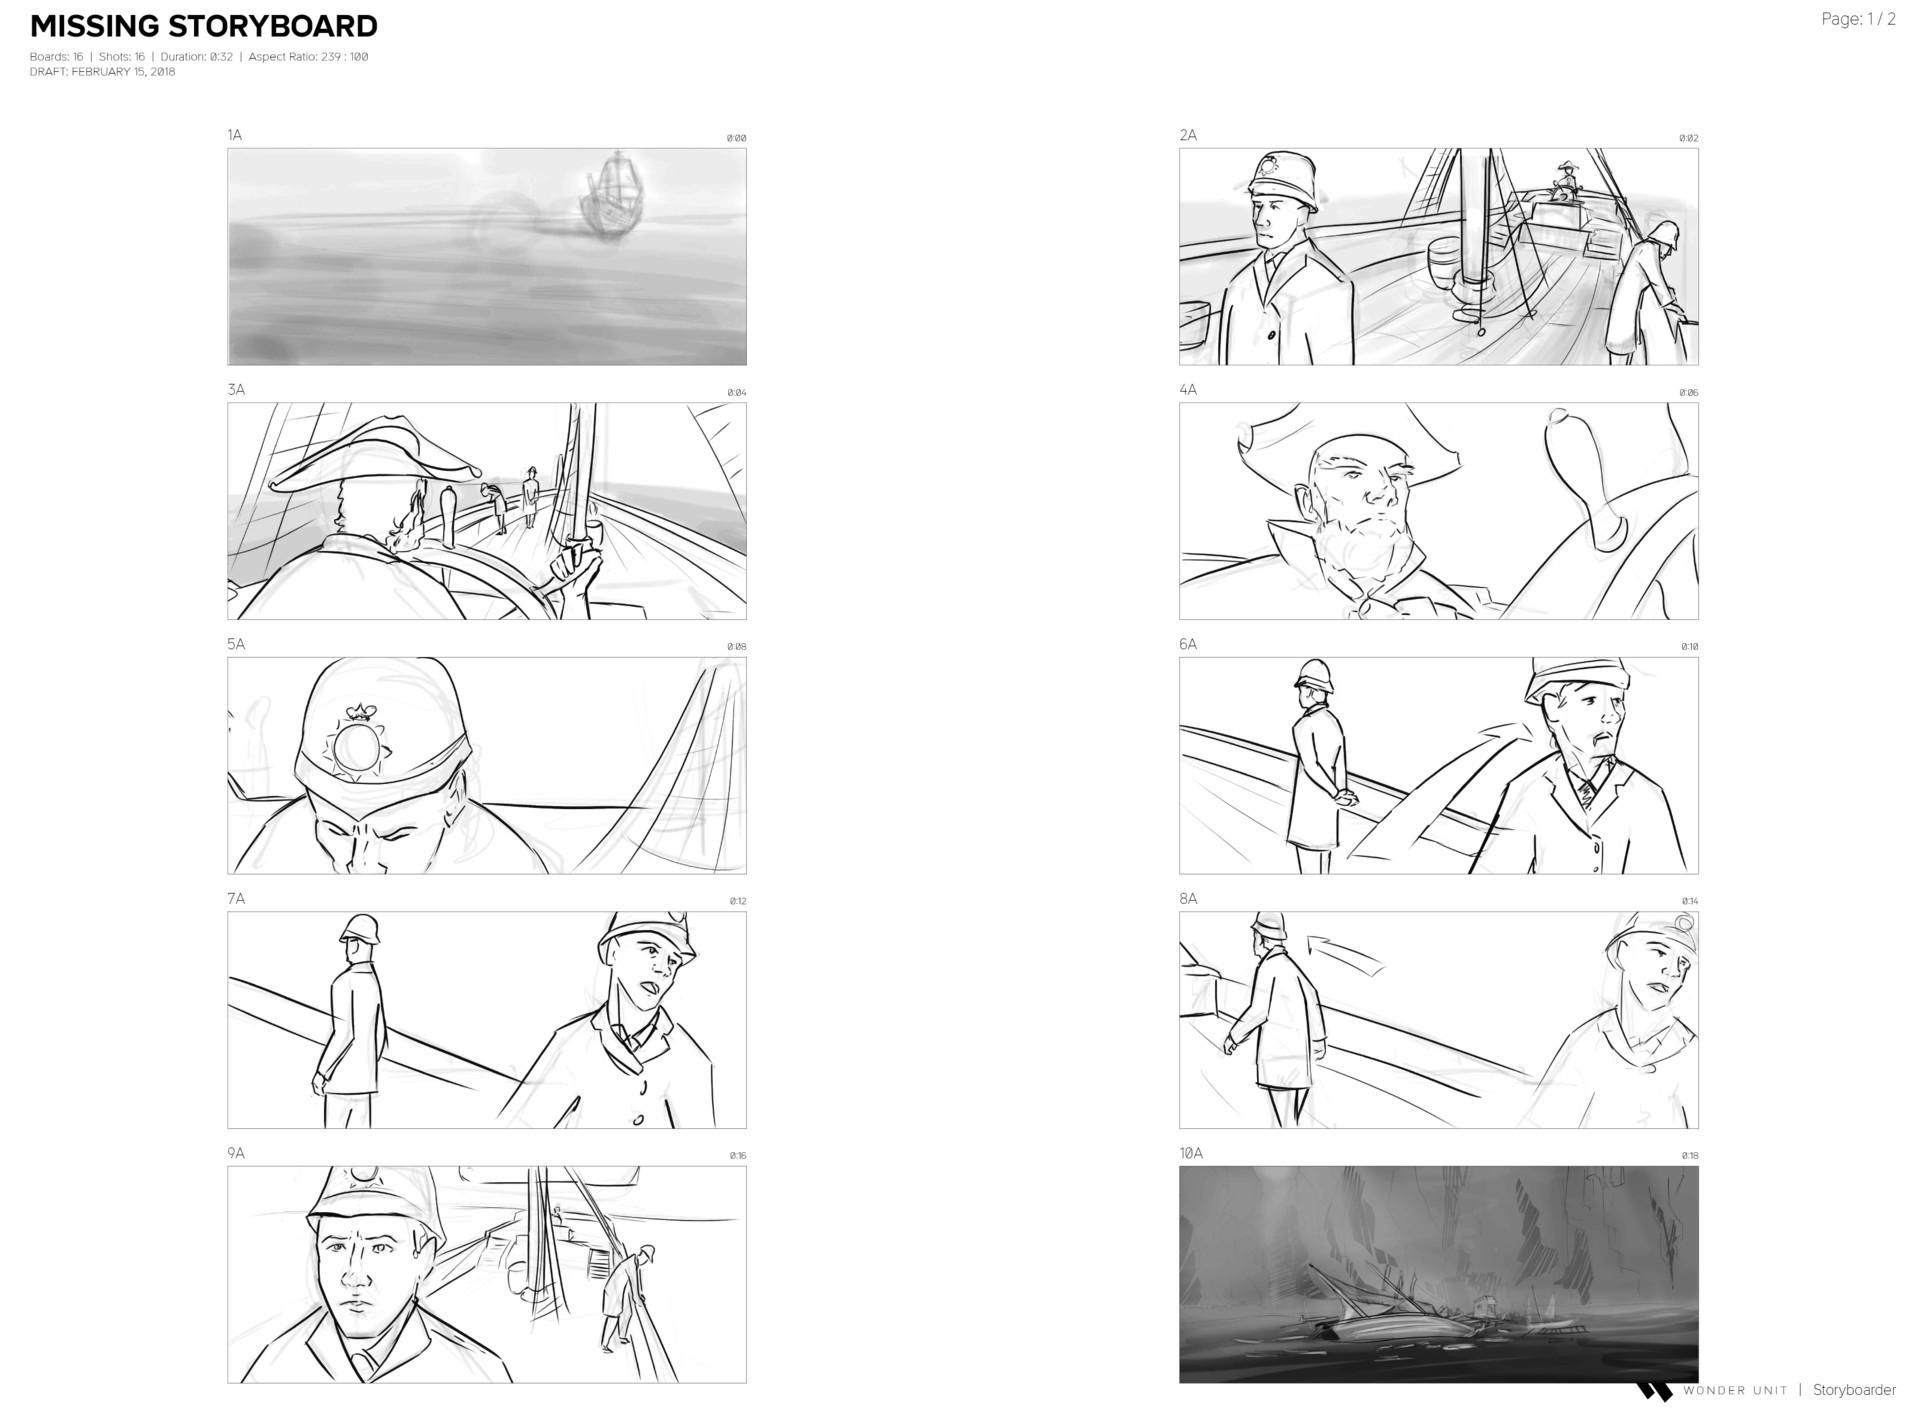 ArtStation - Missing Storyboards, Adam Velazquez